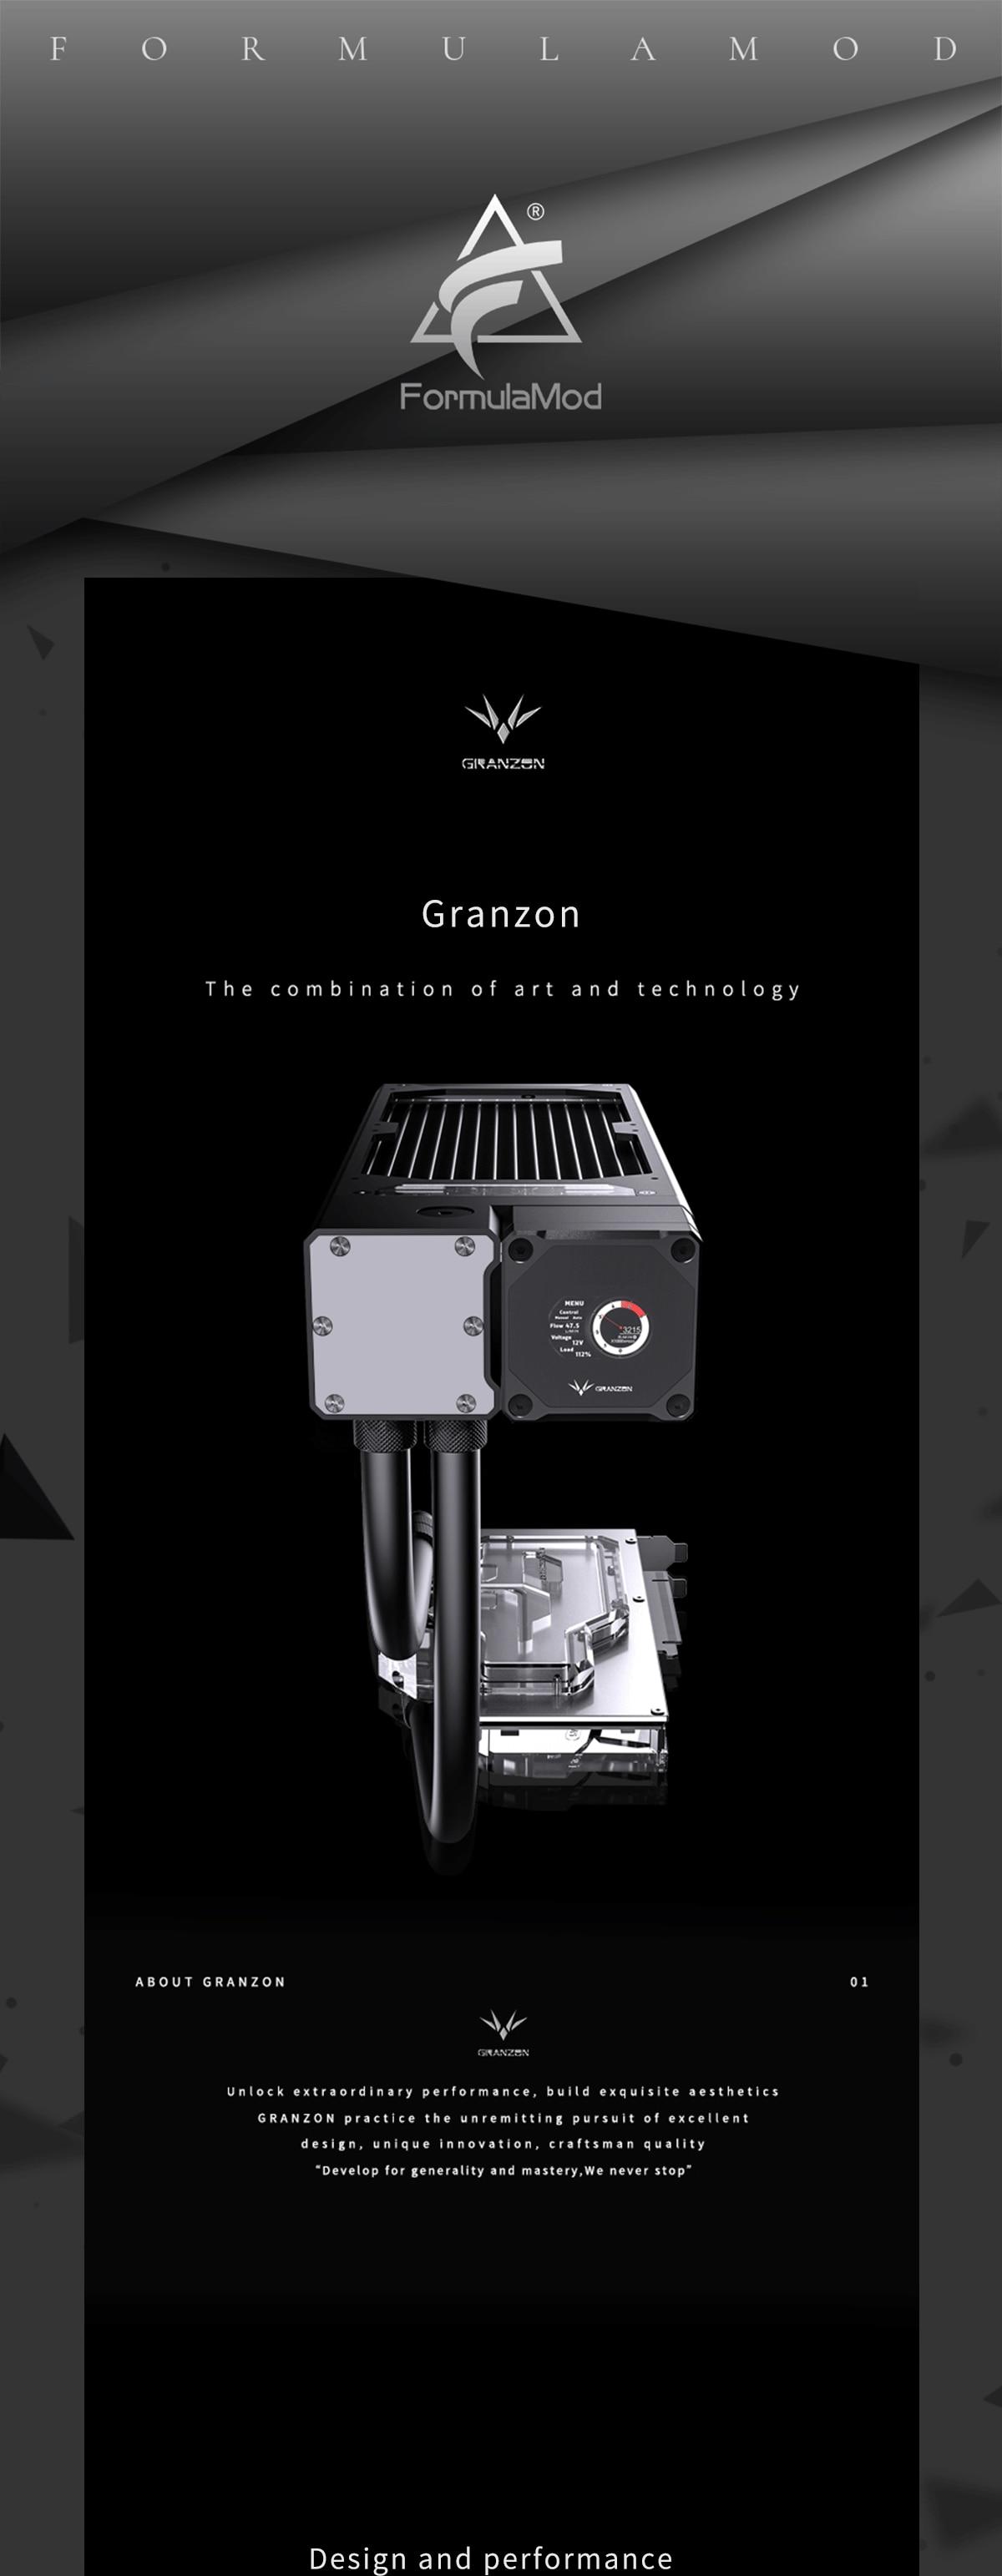 Granzon Advanced GPU Water Cooling Kit With Bykski GPU Block/PWM DDC Pump/240 Radiator/A-RGB Fan/AIO Sotf Tube, GZGPU-M240N